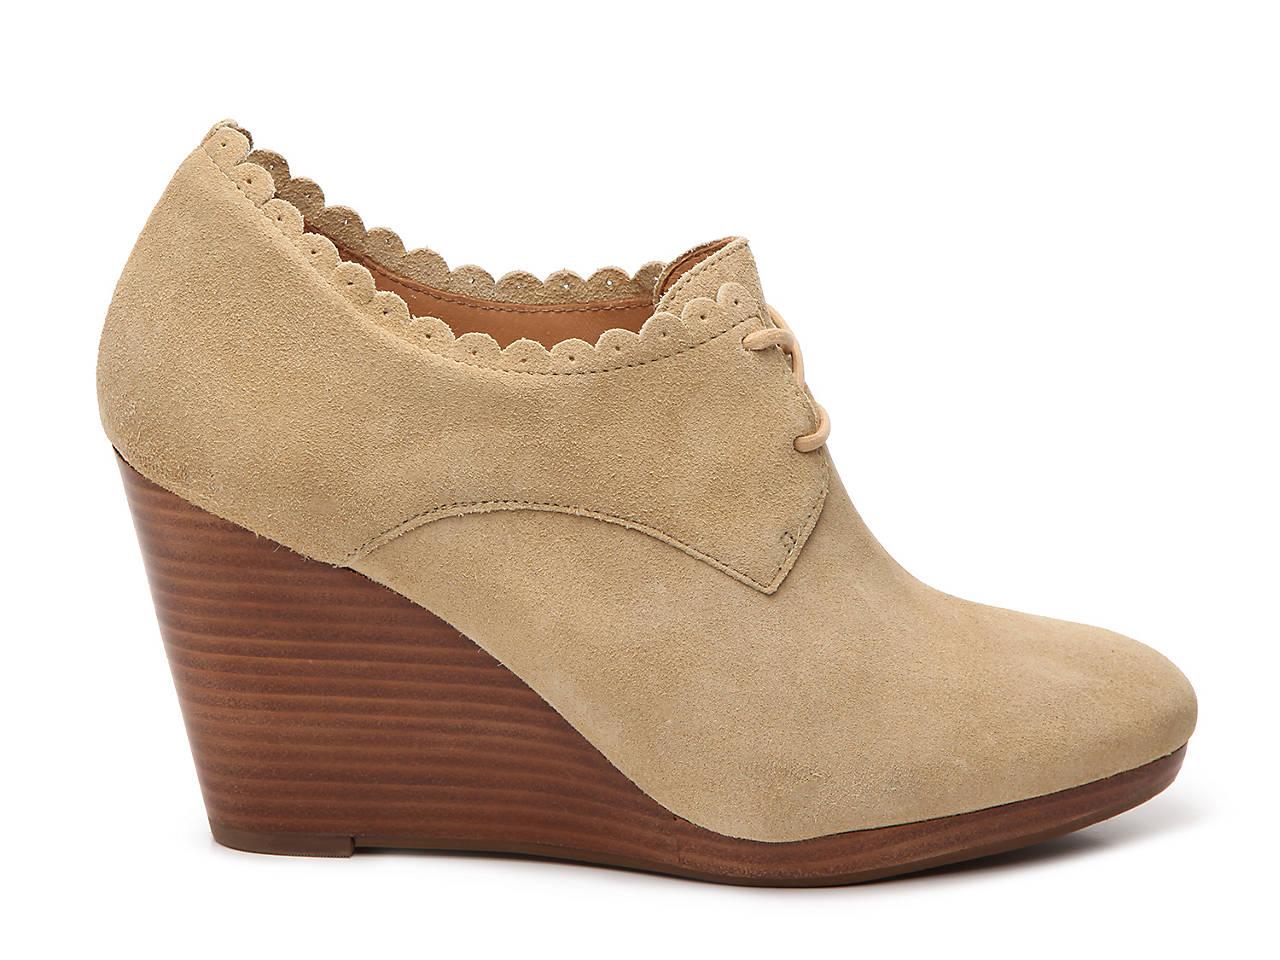 e74ca0f557d Jack Rogers Olivia Wedge Bootie Men s Shoes